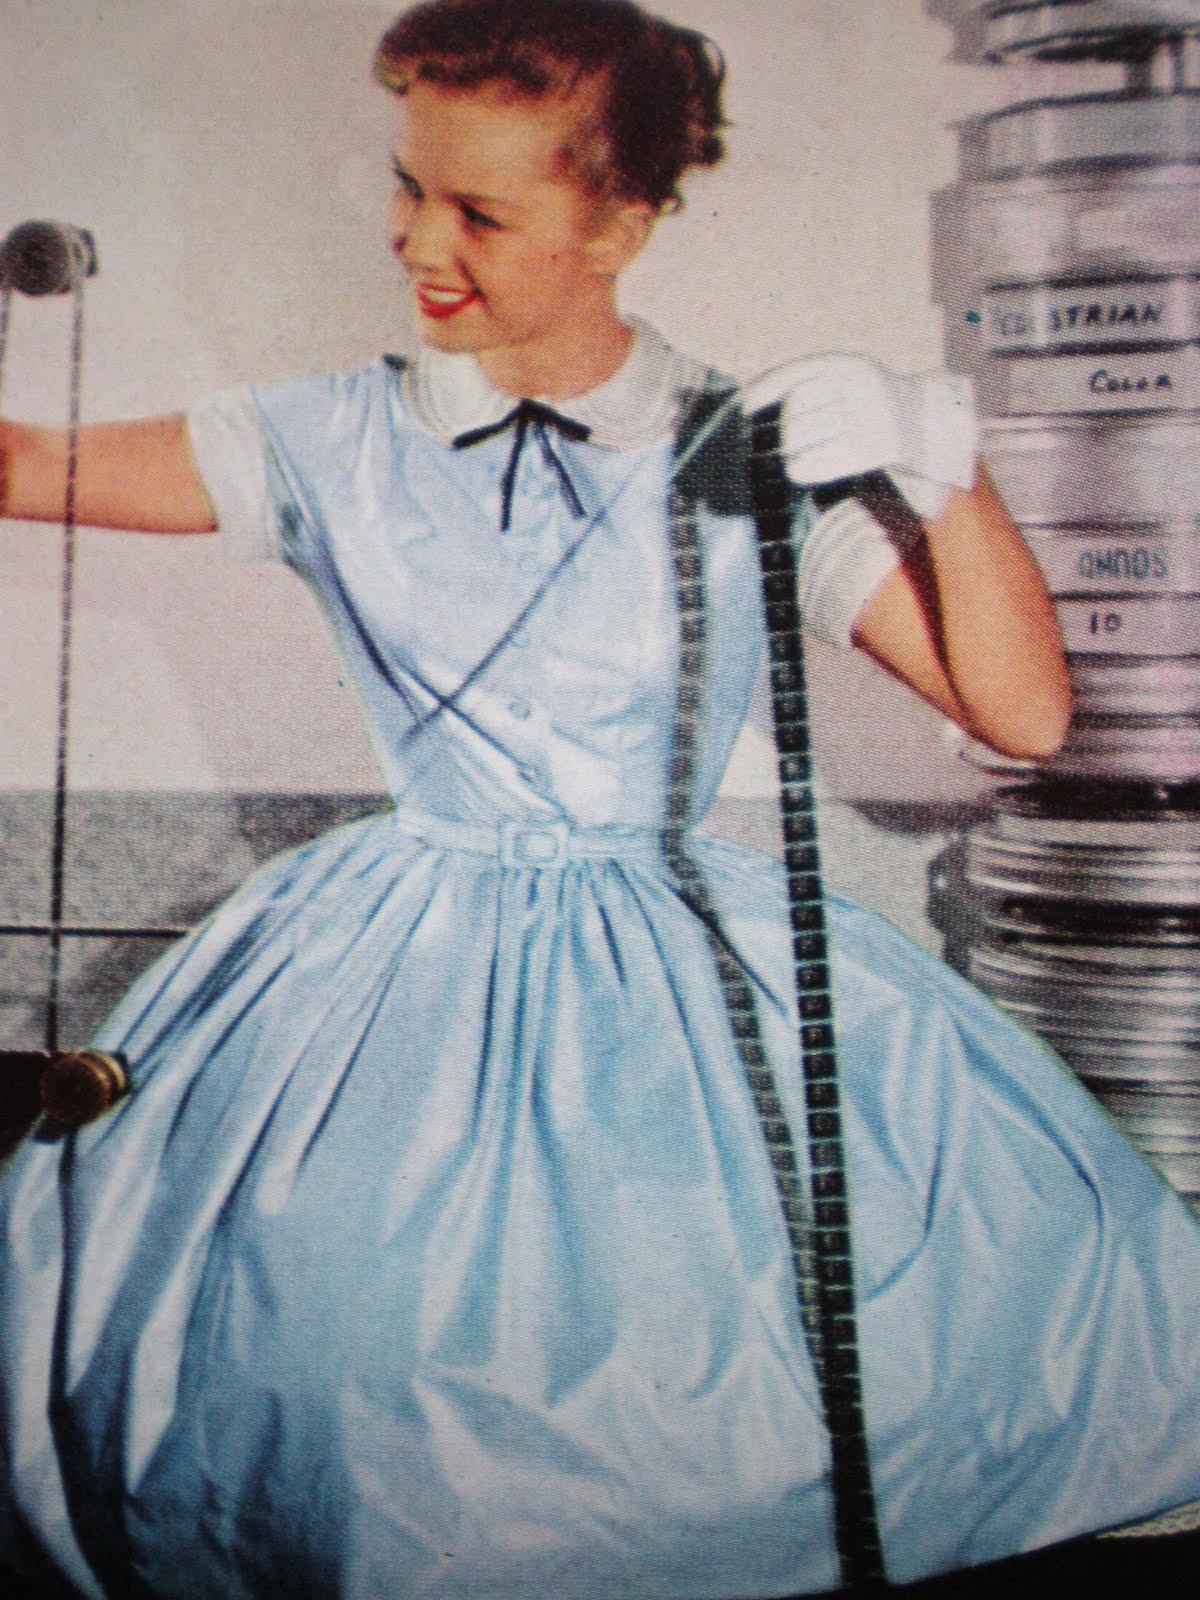 95351c61fa45 1950 s Vintage Dress Styles  Sew Summer Dresses Now! Liz Taylor Janet Leigh  Debbie Reynolds